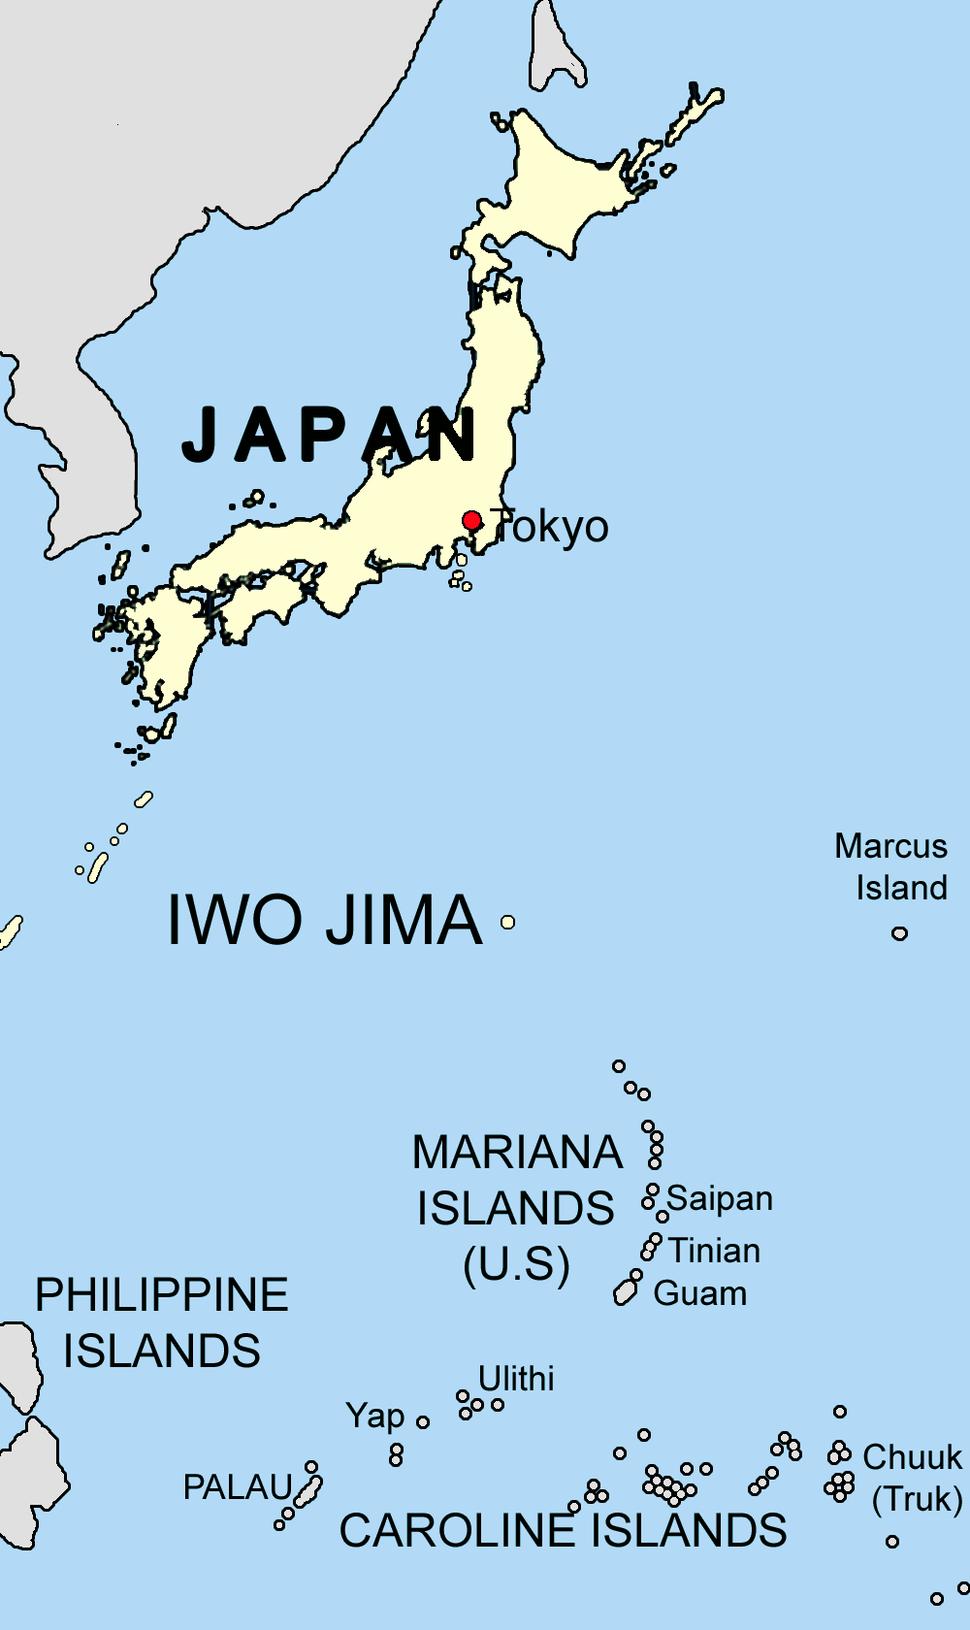 Iwo jima location mapSagredo